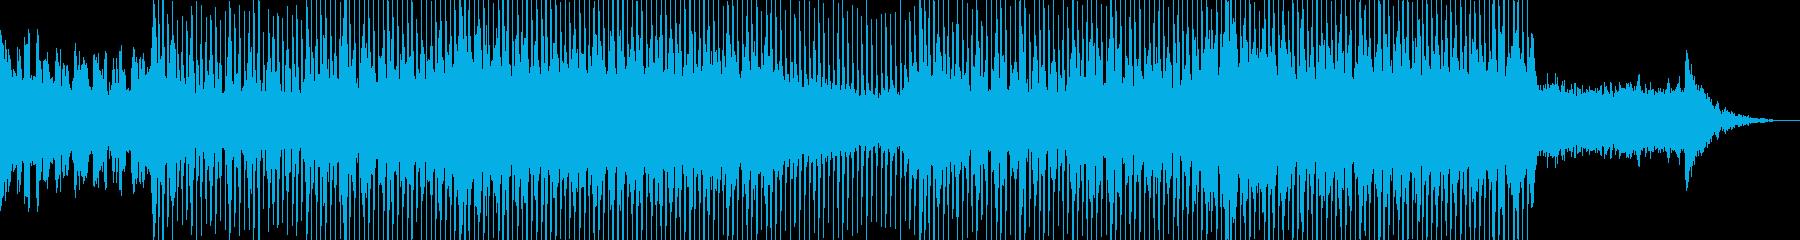 EDMクラブ系ダンスミュージック-03の再生済みの波形